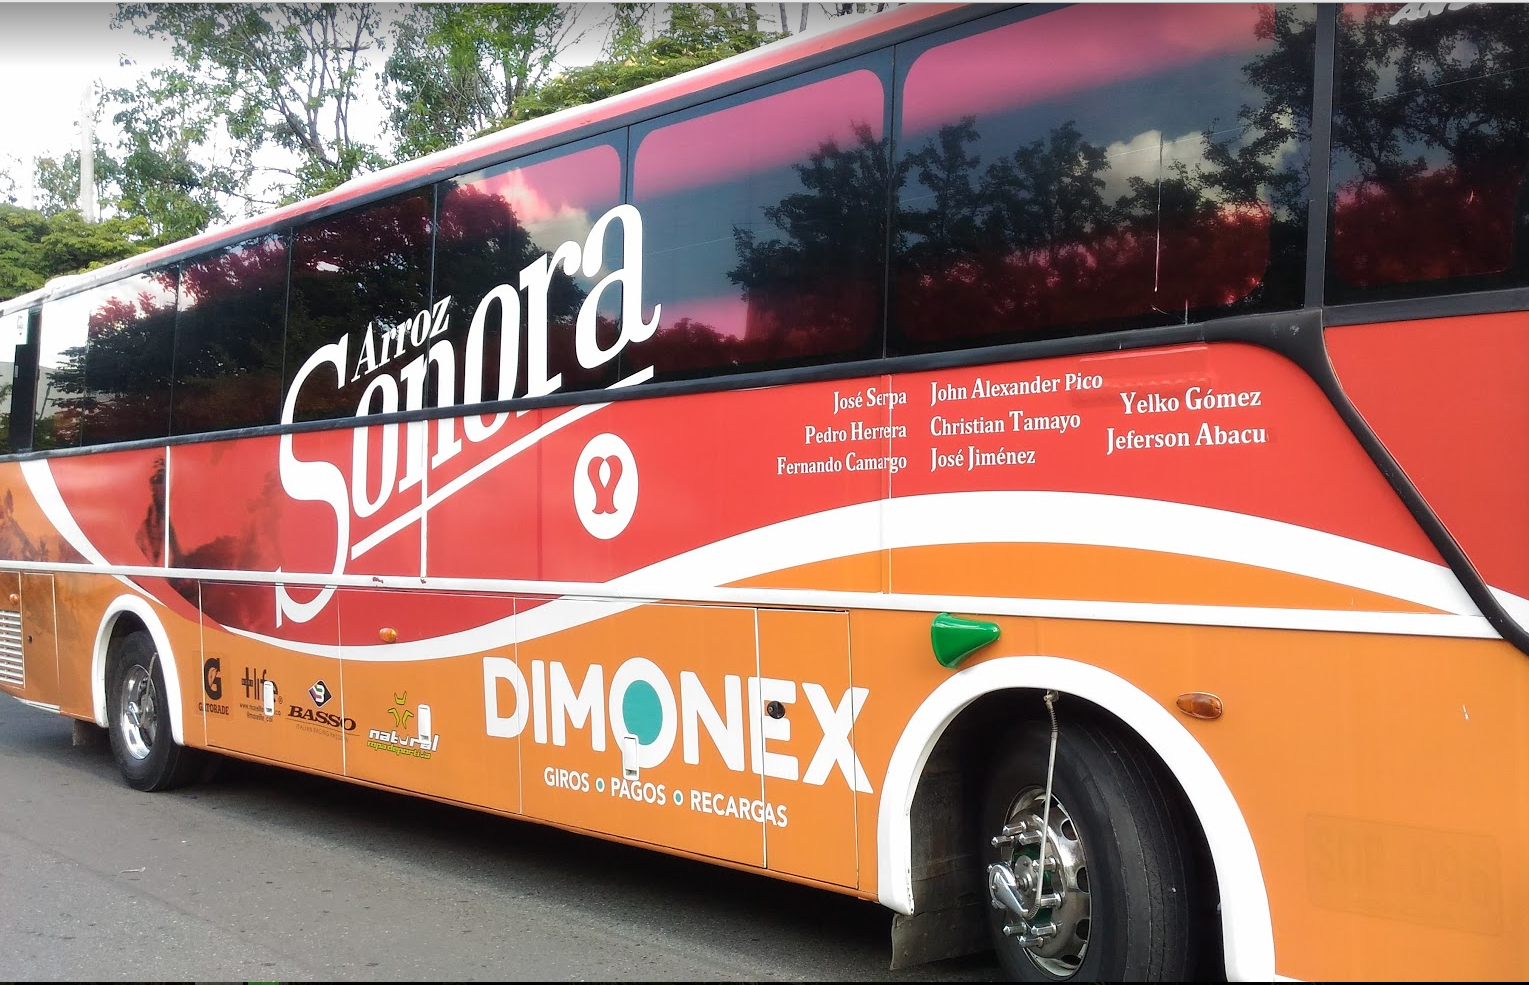 Vuelta a Colombia 2016 - Página 2 5fdd627bce2246078c95601d3f5bf172